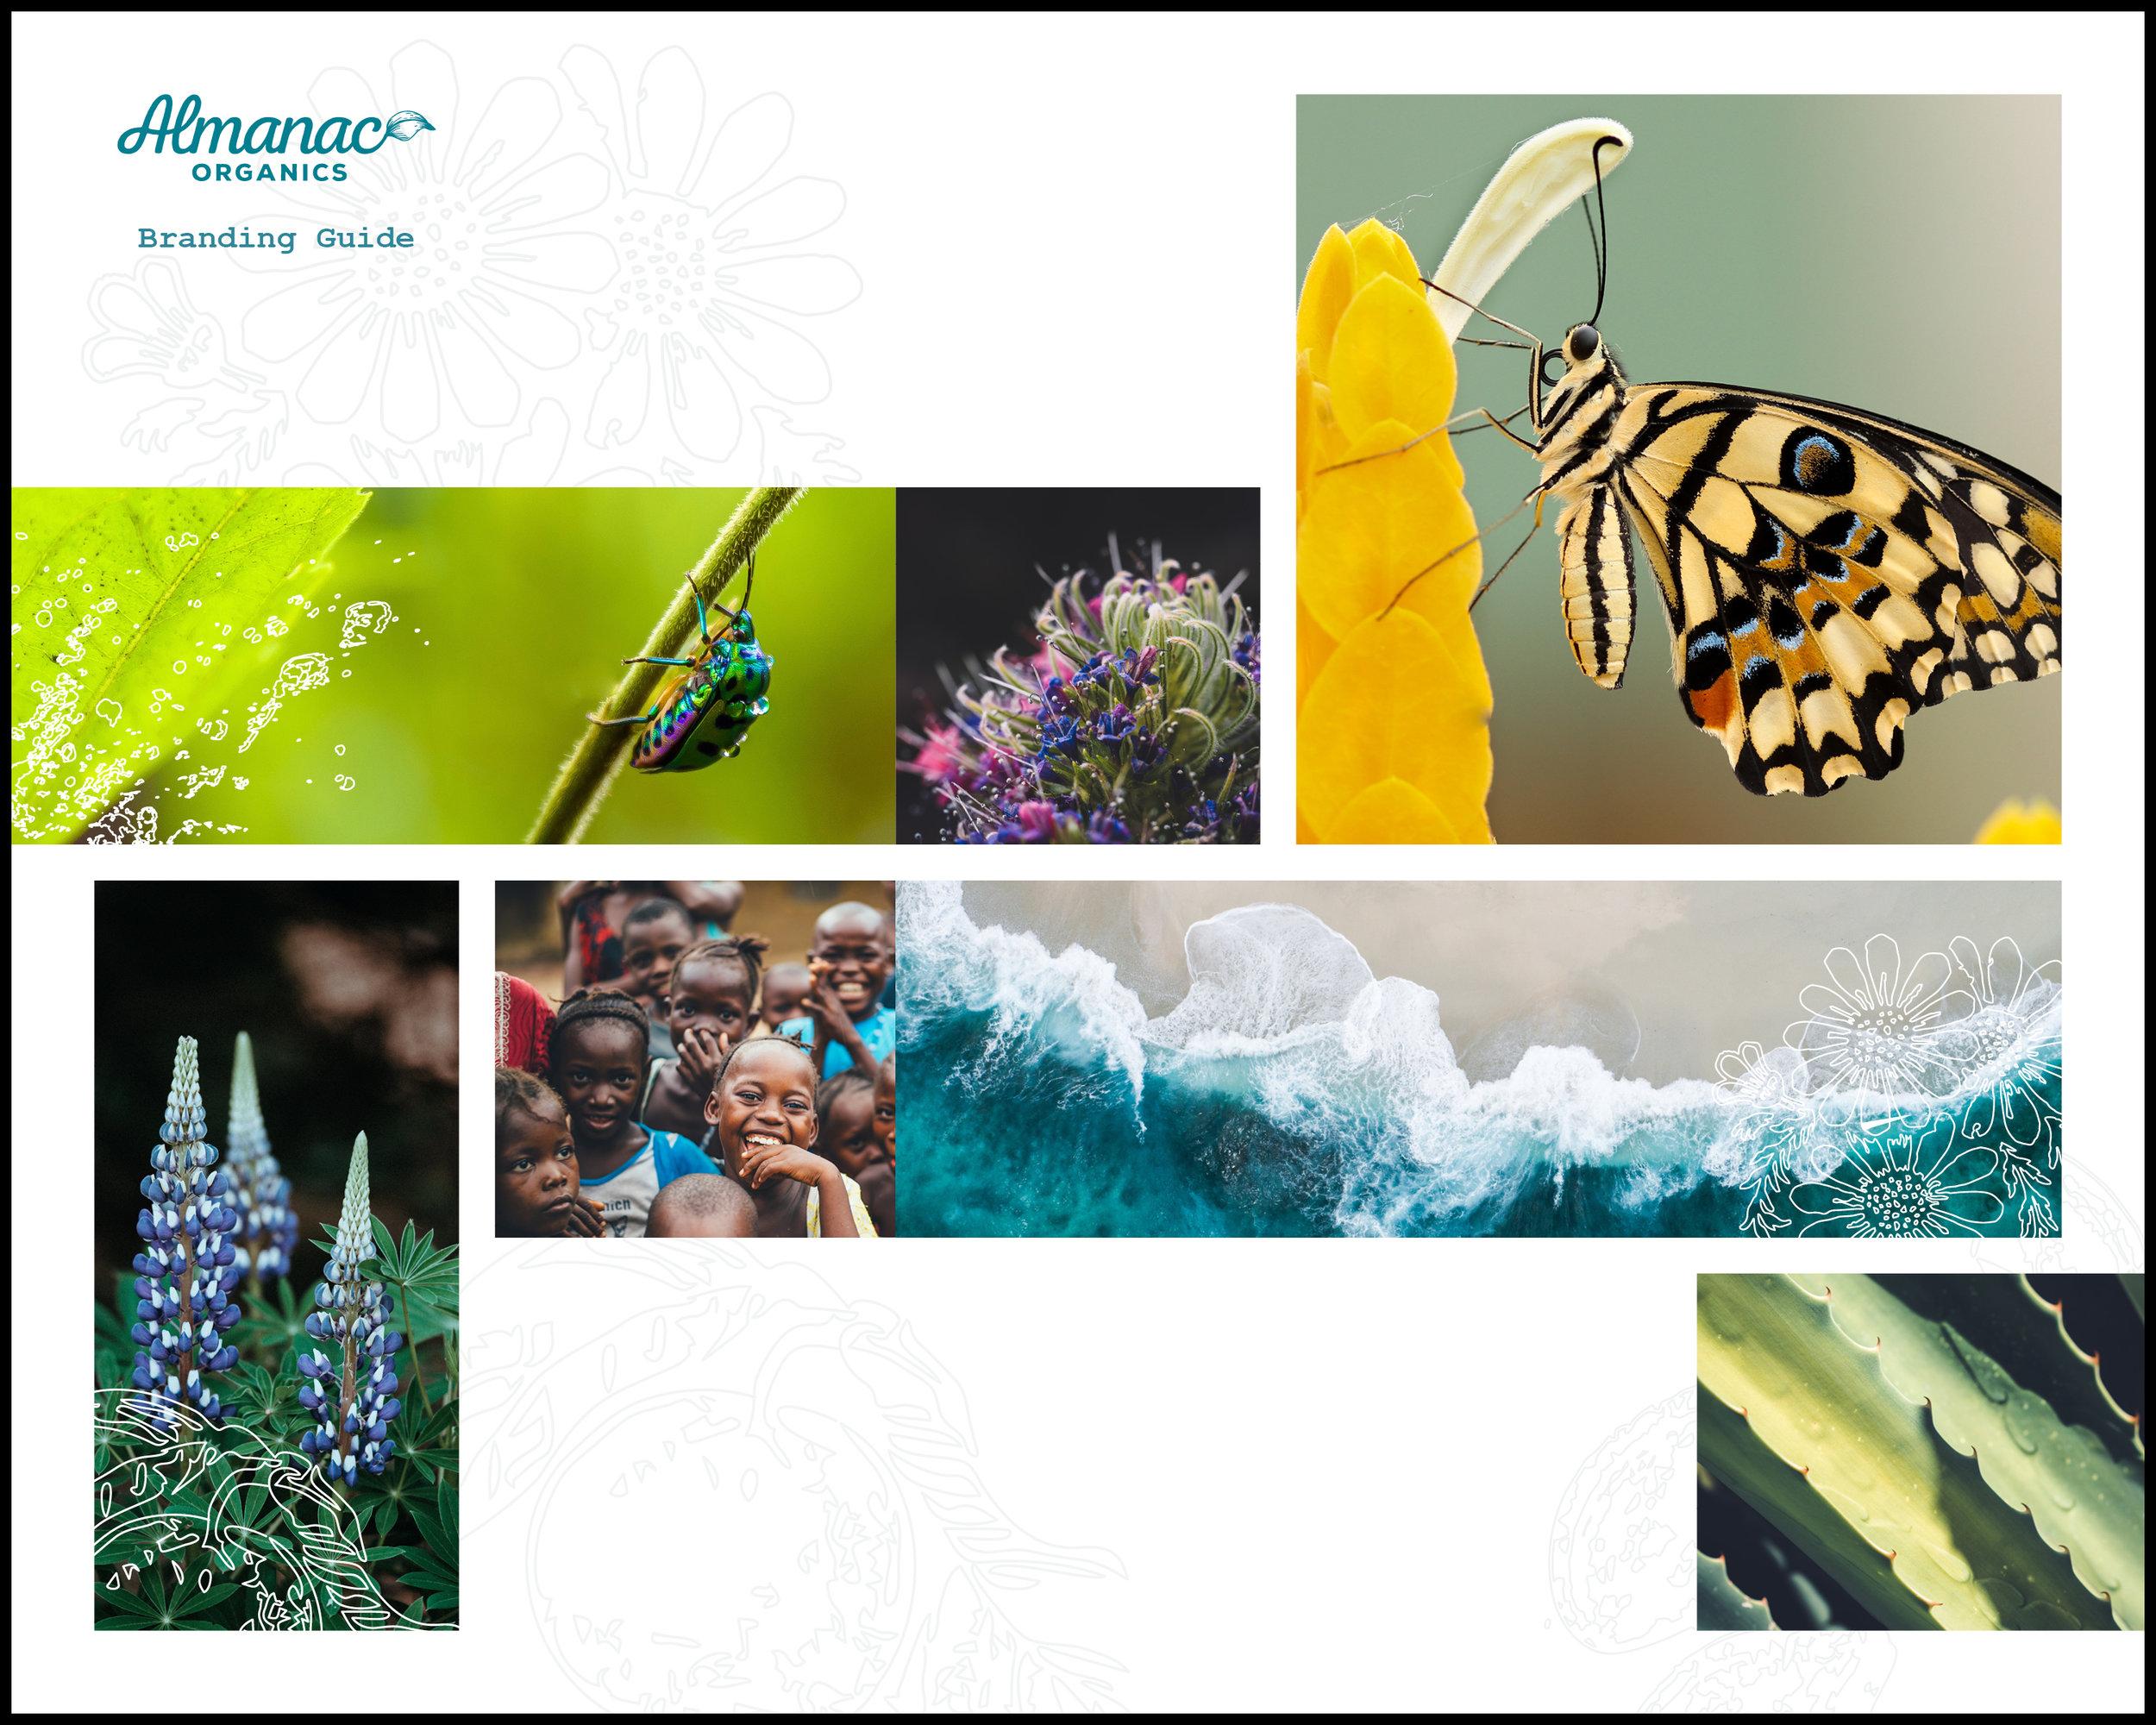 Almanac_Organics_Branding_Guide.jpg